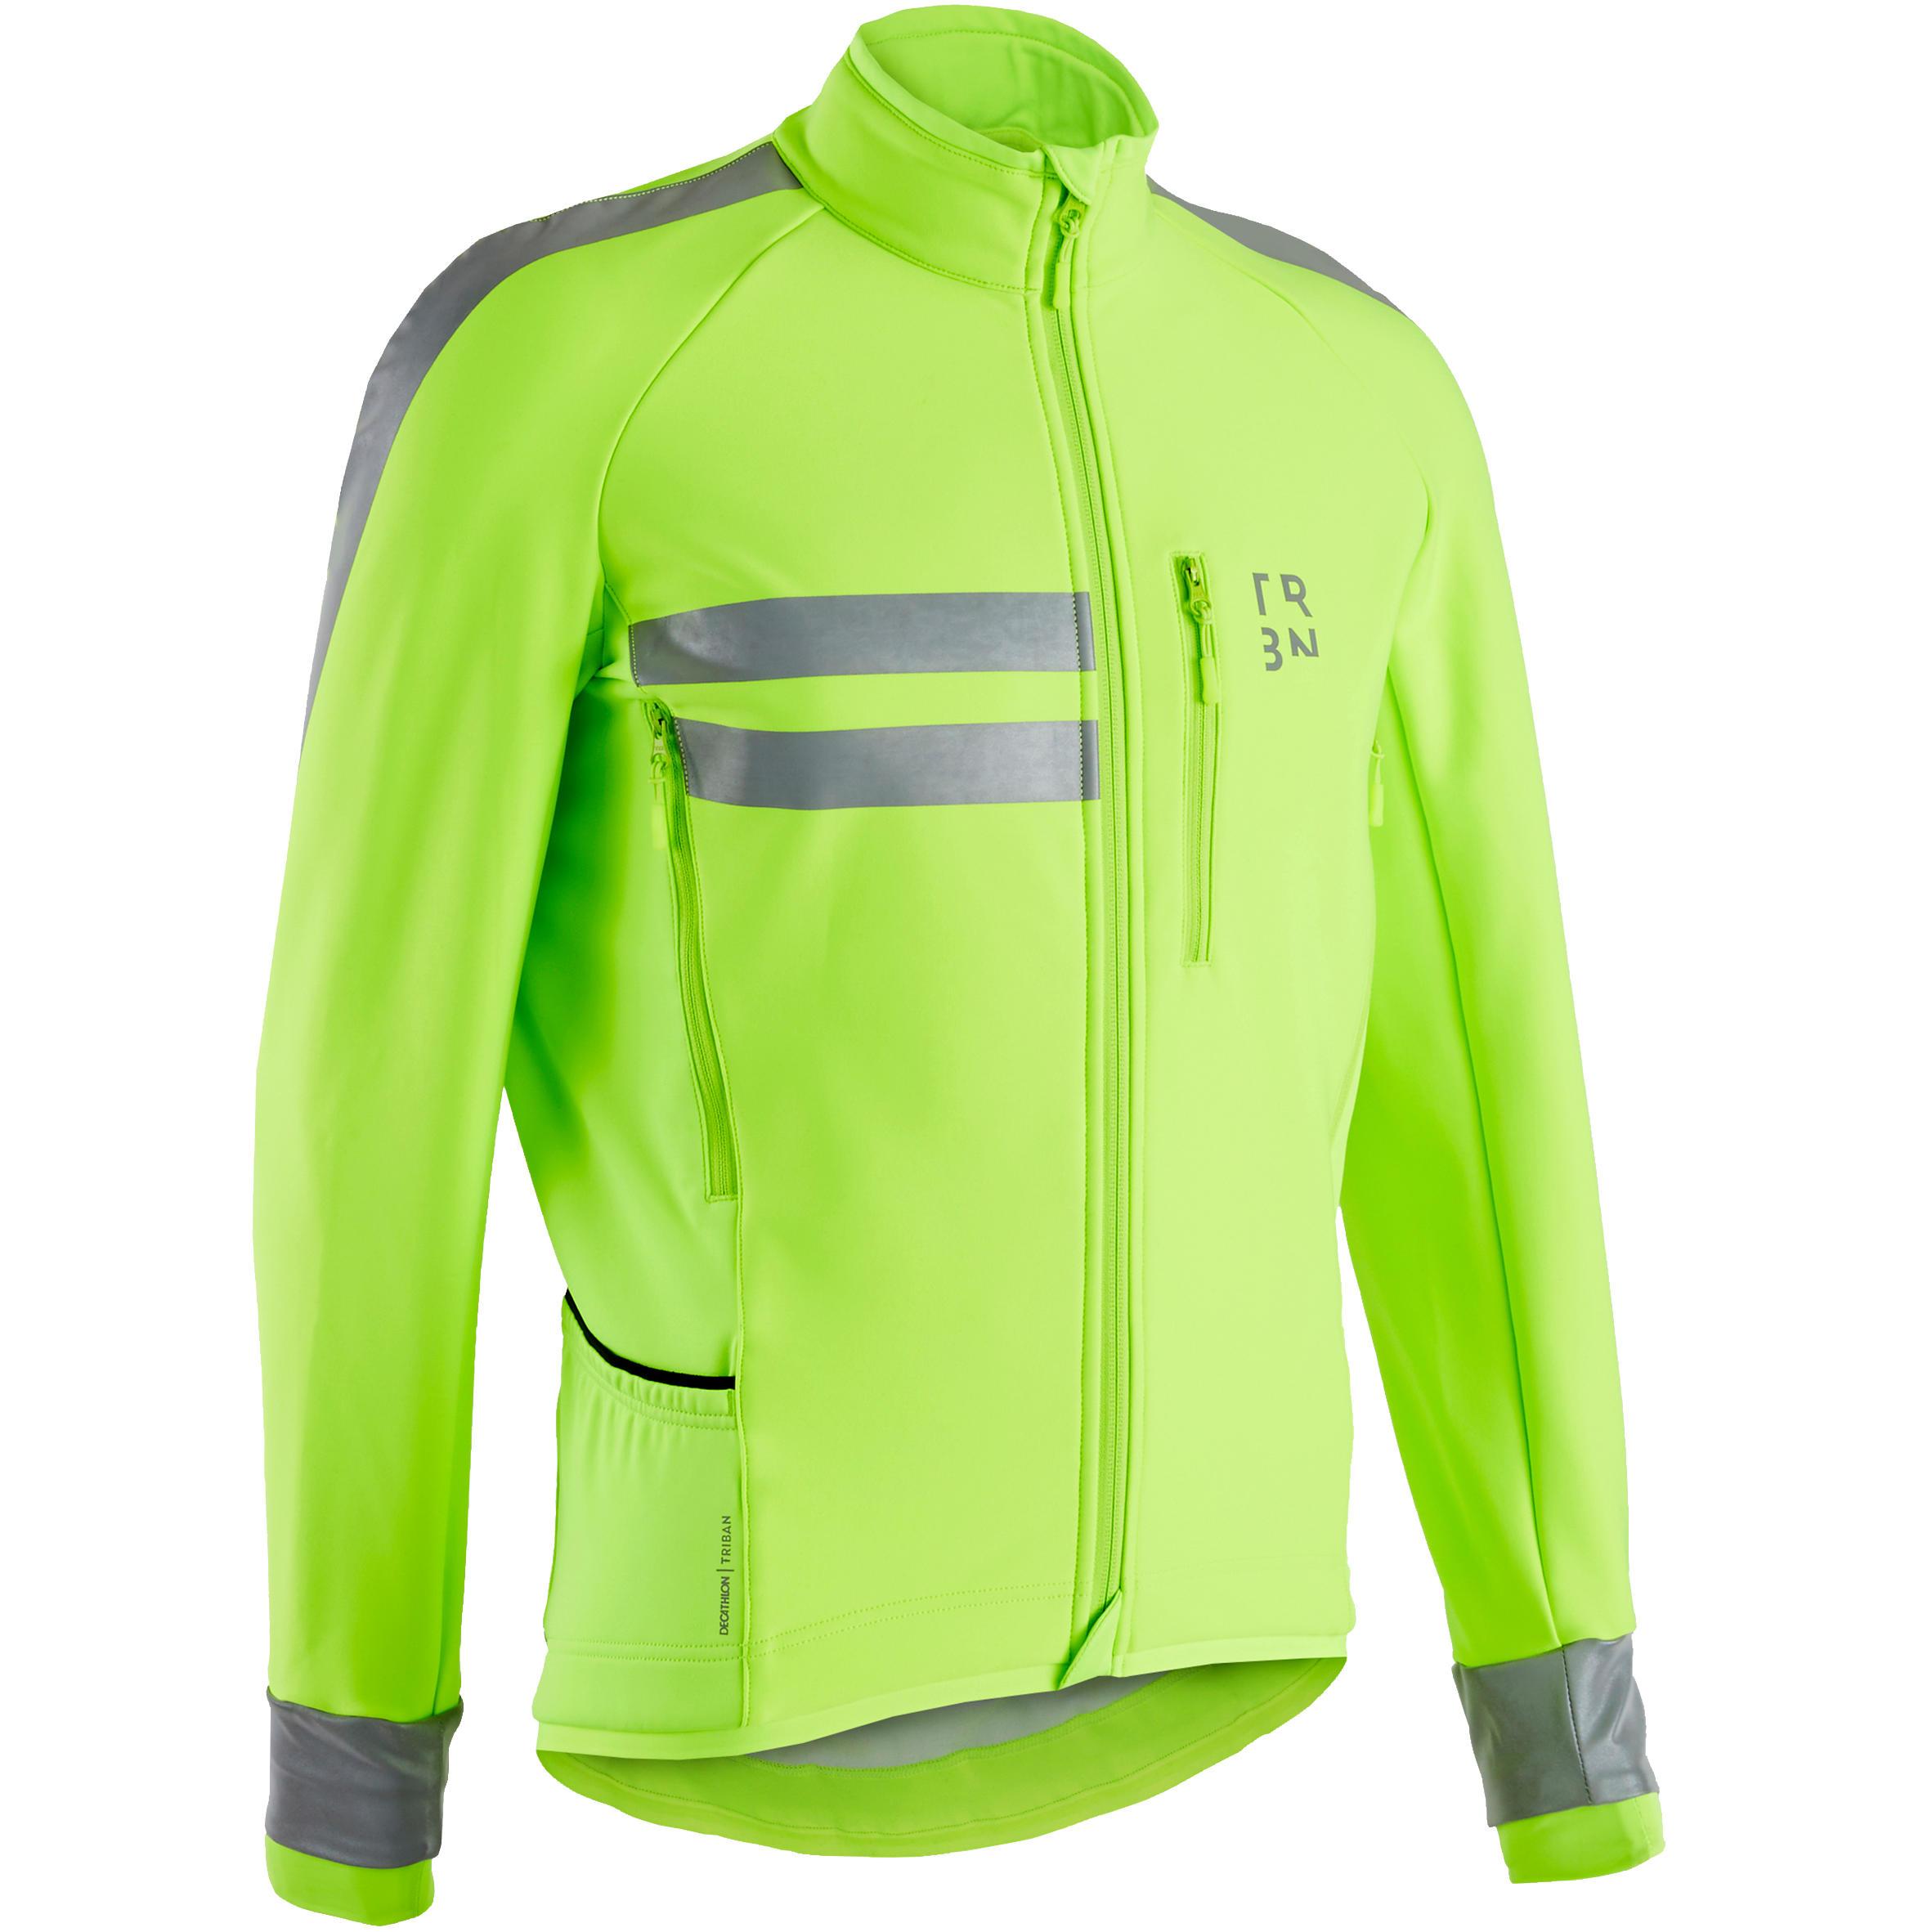 Jachetă ciclism RC 500